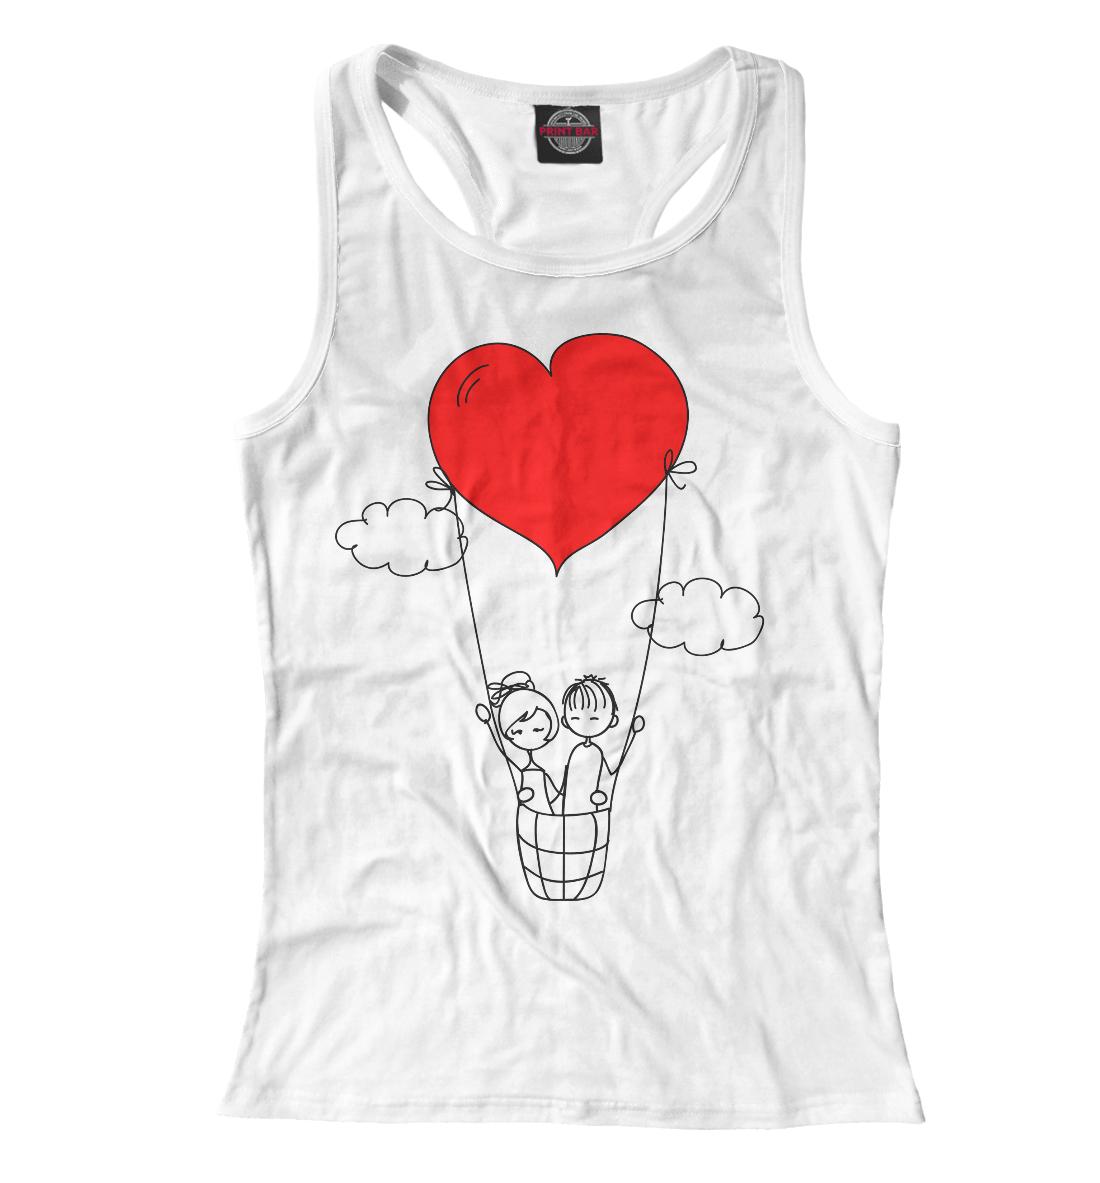 Купить Человечки и сердечки, Printbar, Майки борцовки, 14F-778657-mayb-1